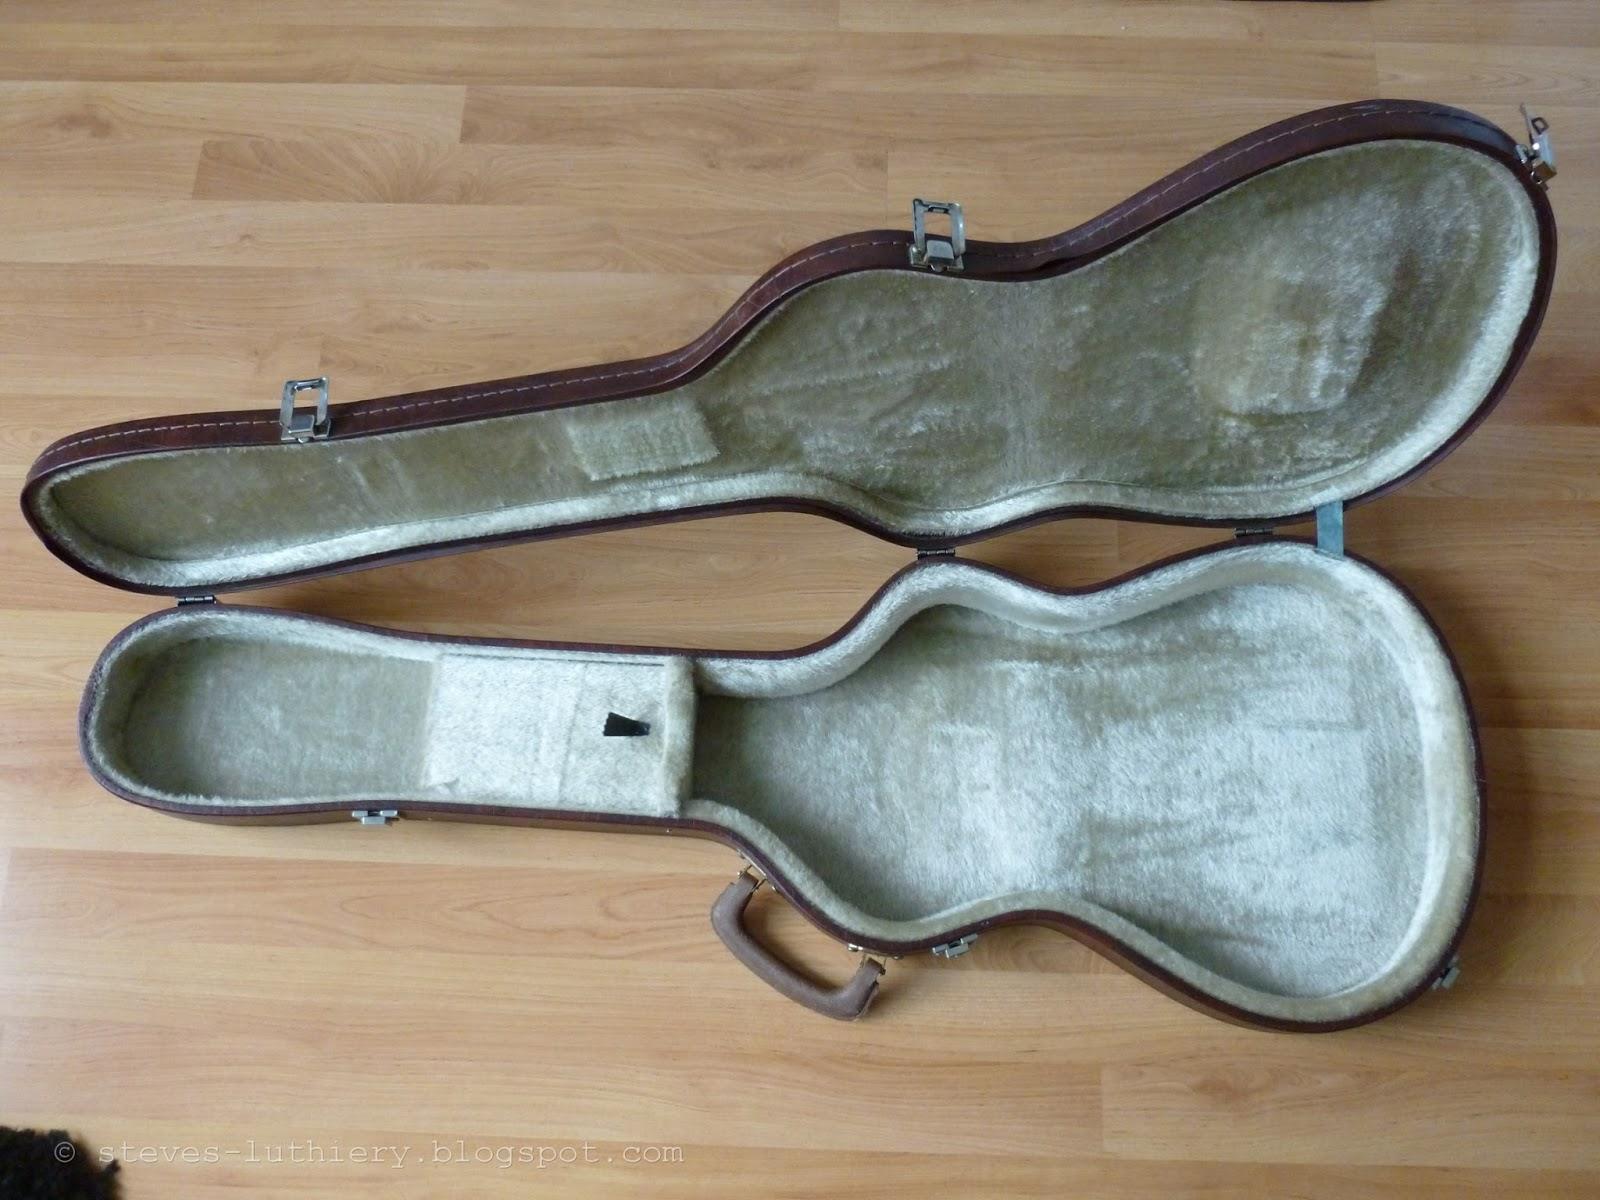 Steve\'s Luthiery Blog: 2013